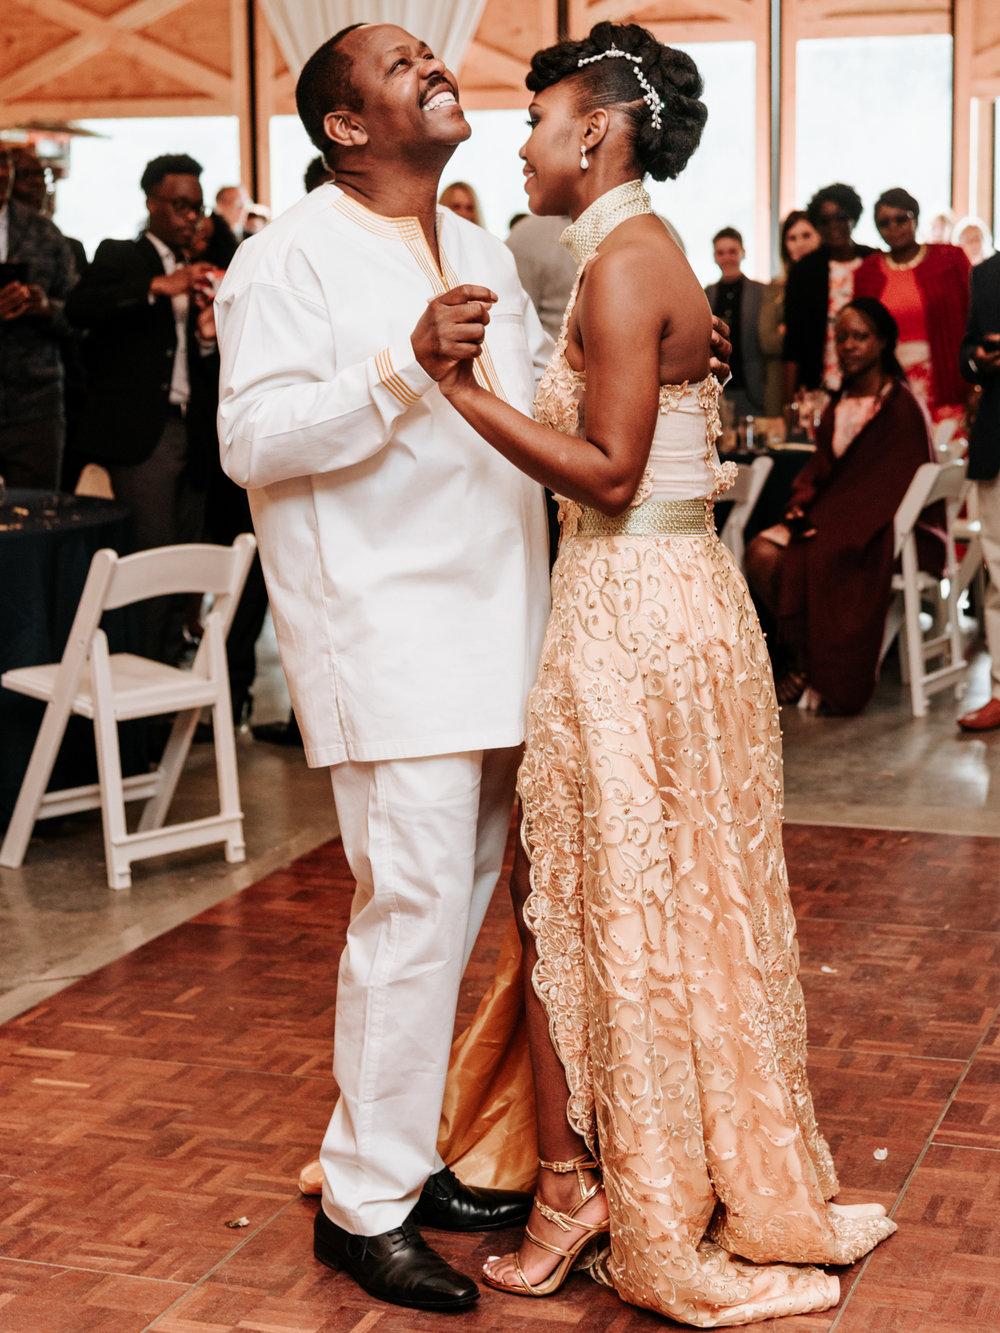 Stolen Glimpses Seattle Wedding Photographer at Rein Fire Ranch 79.jpg